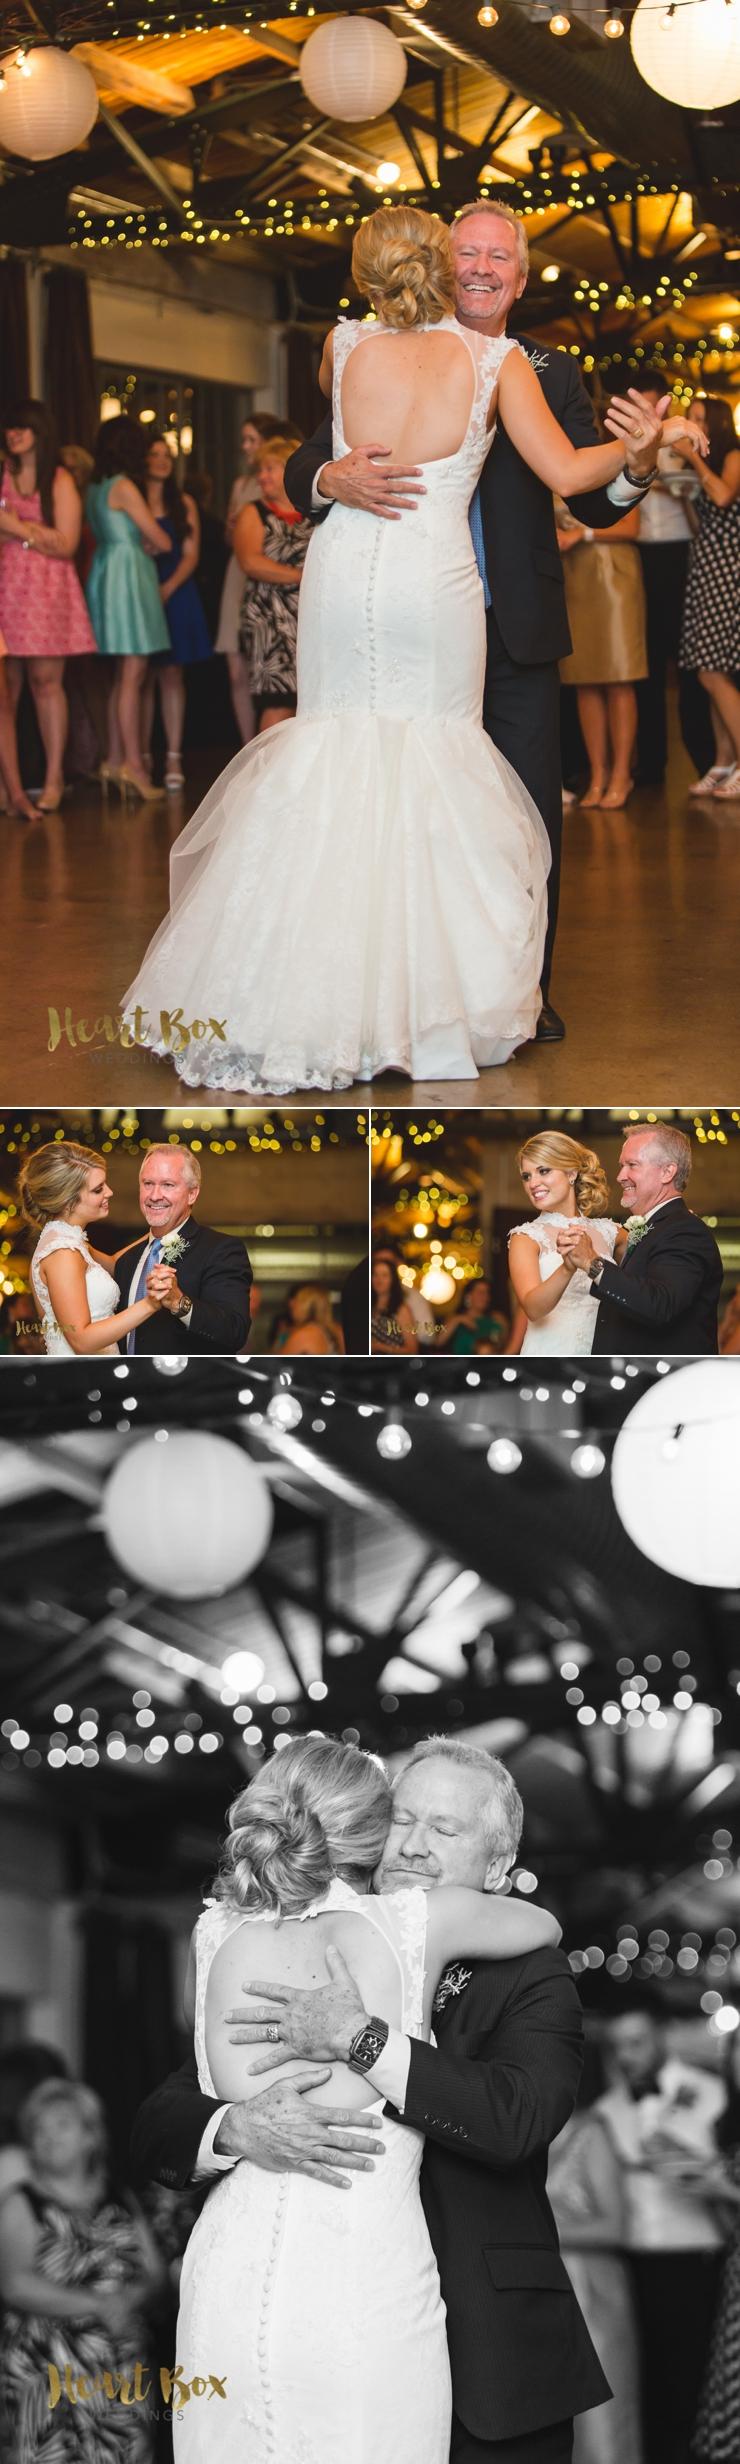 Mabry Wedding 21.jpg